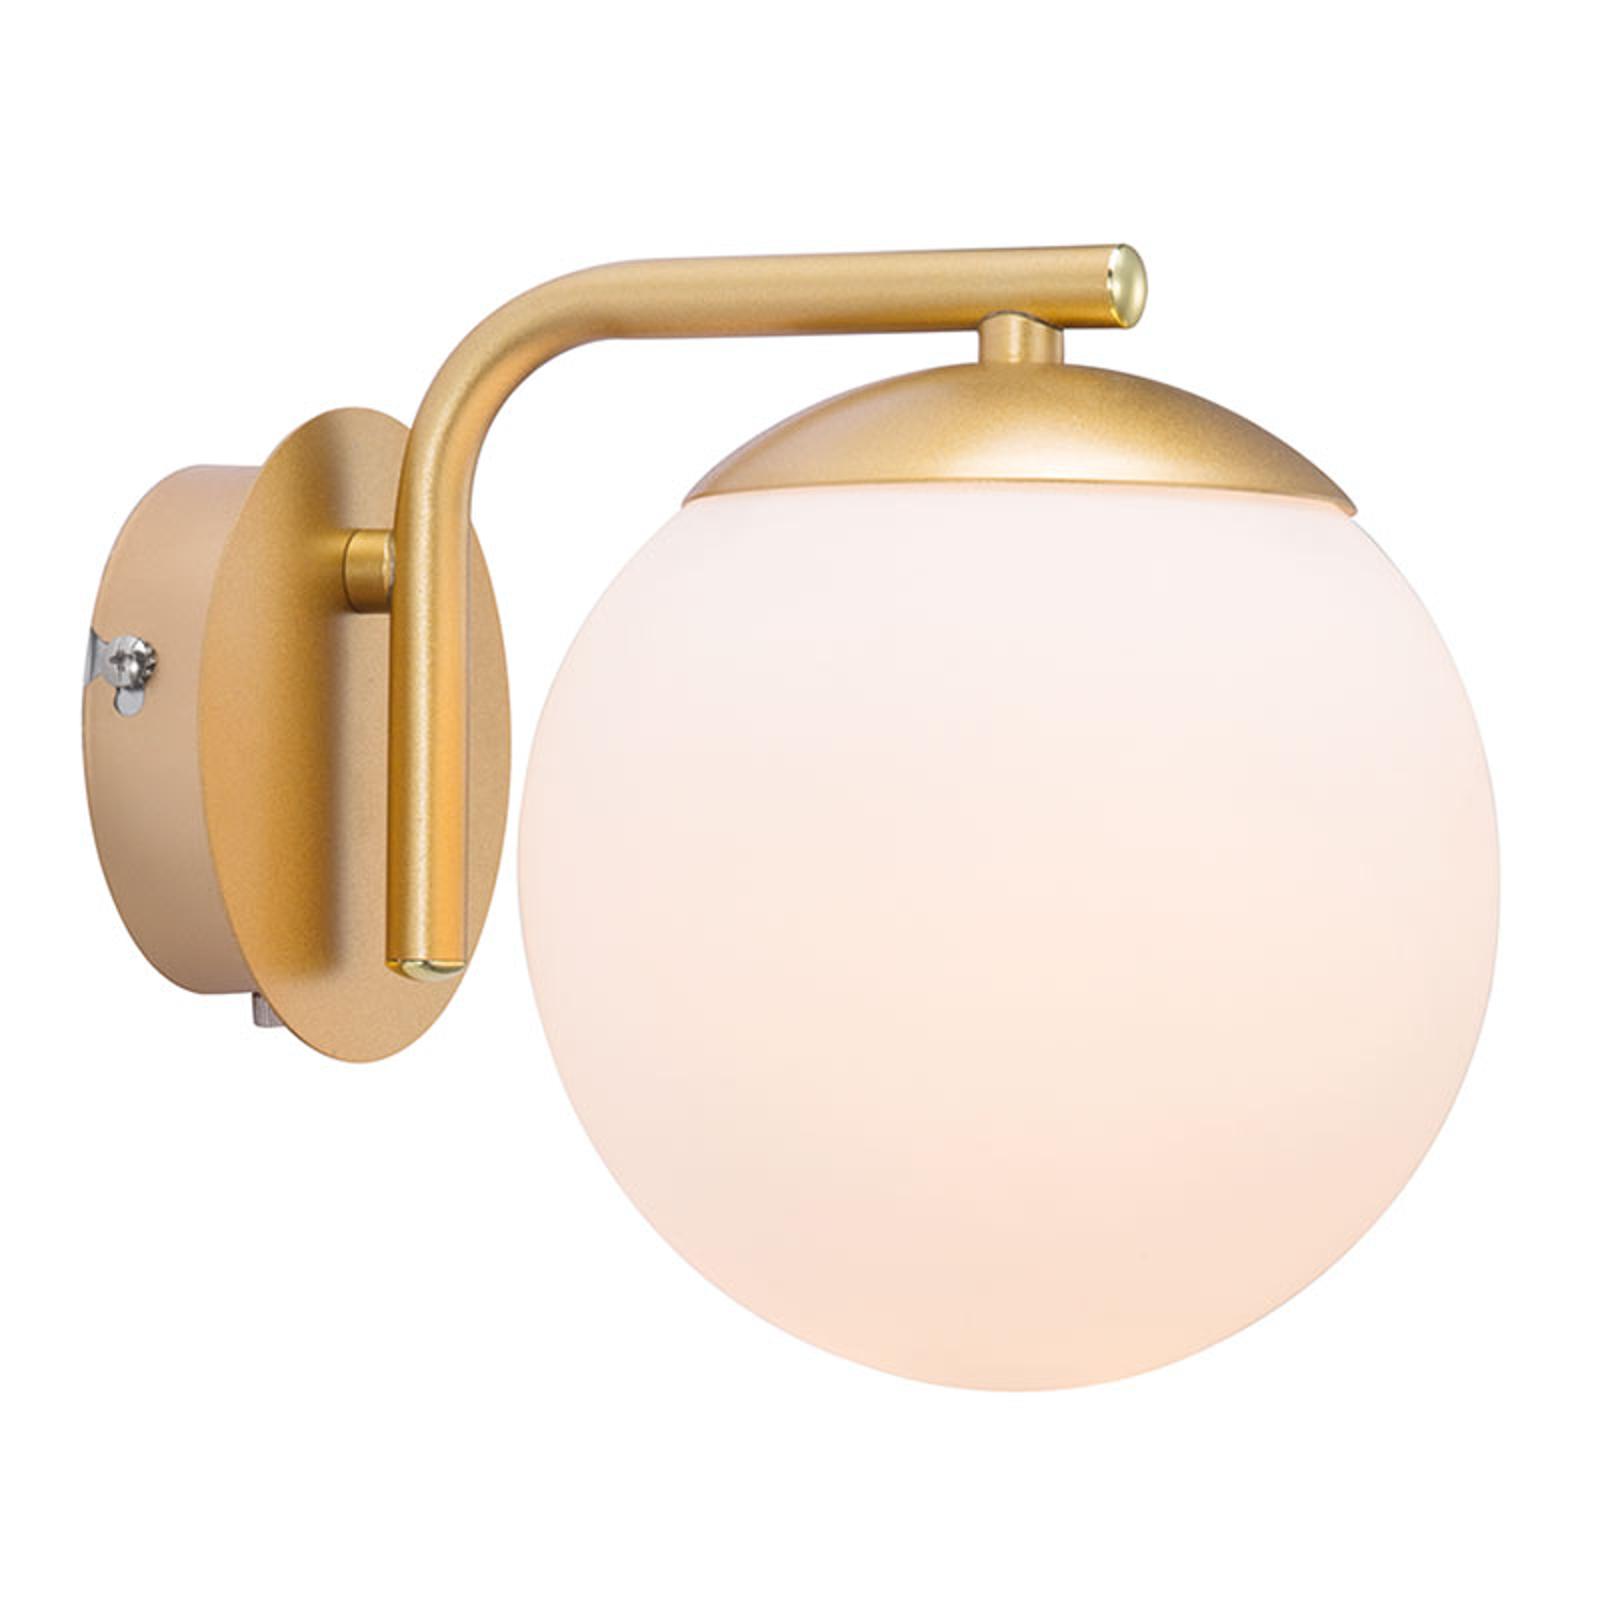 Vegglampe Grant med plugg, messing